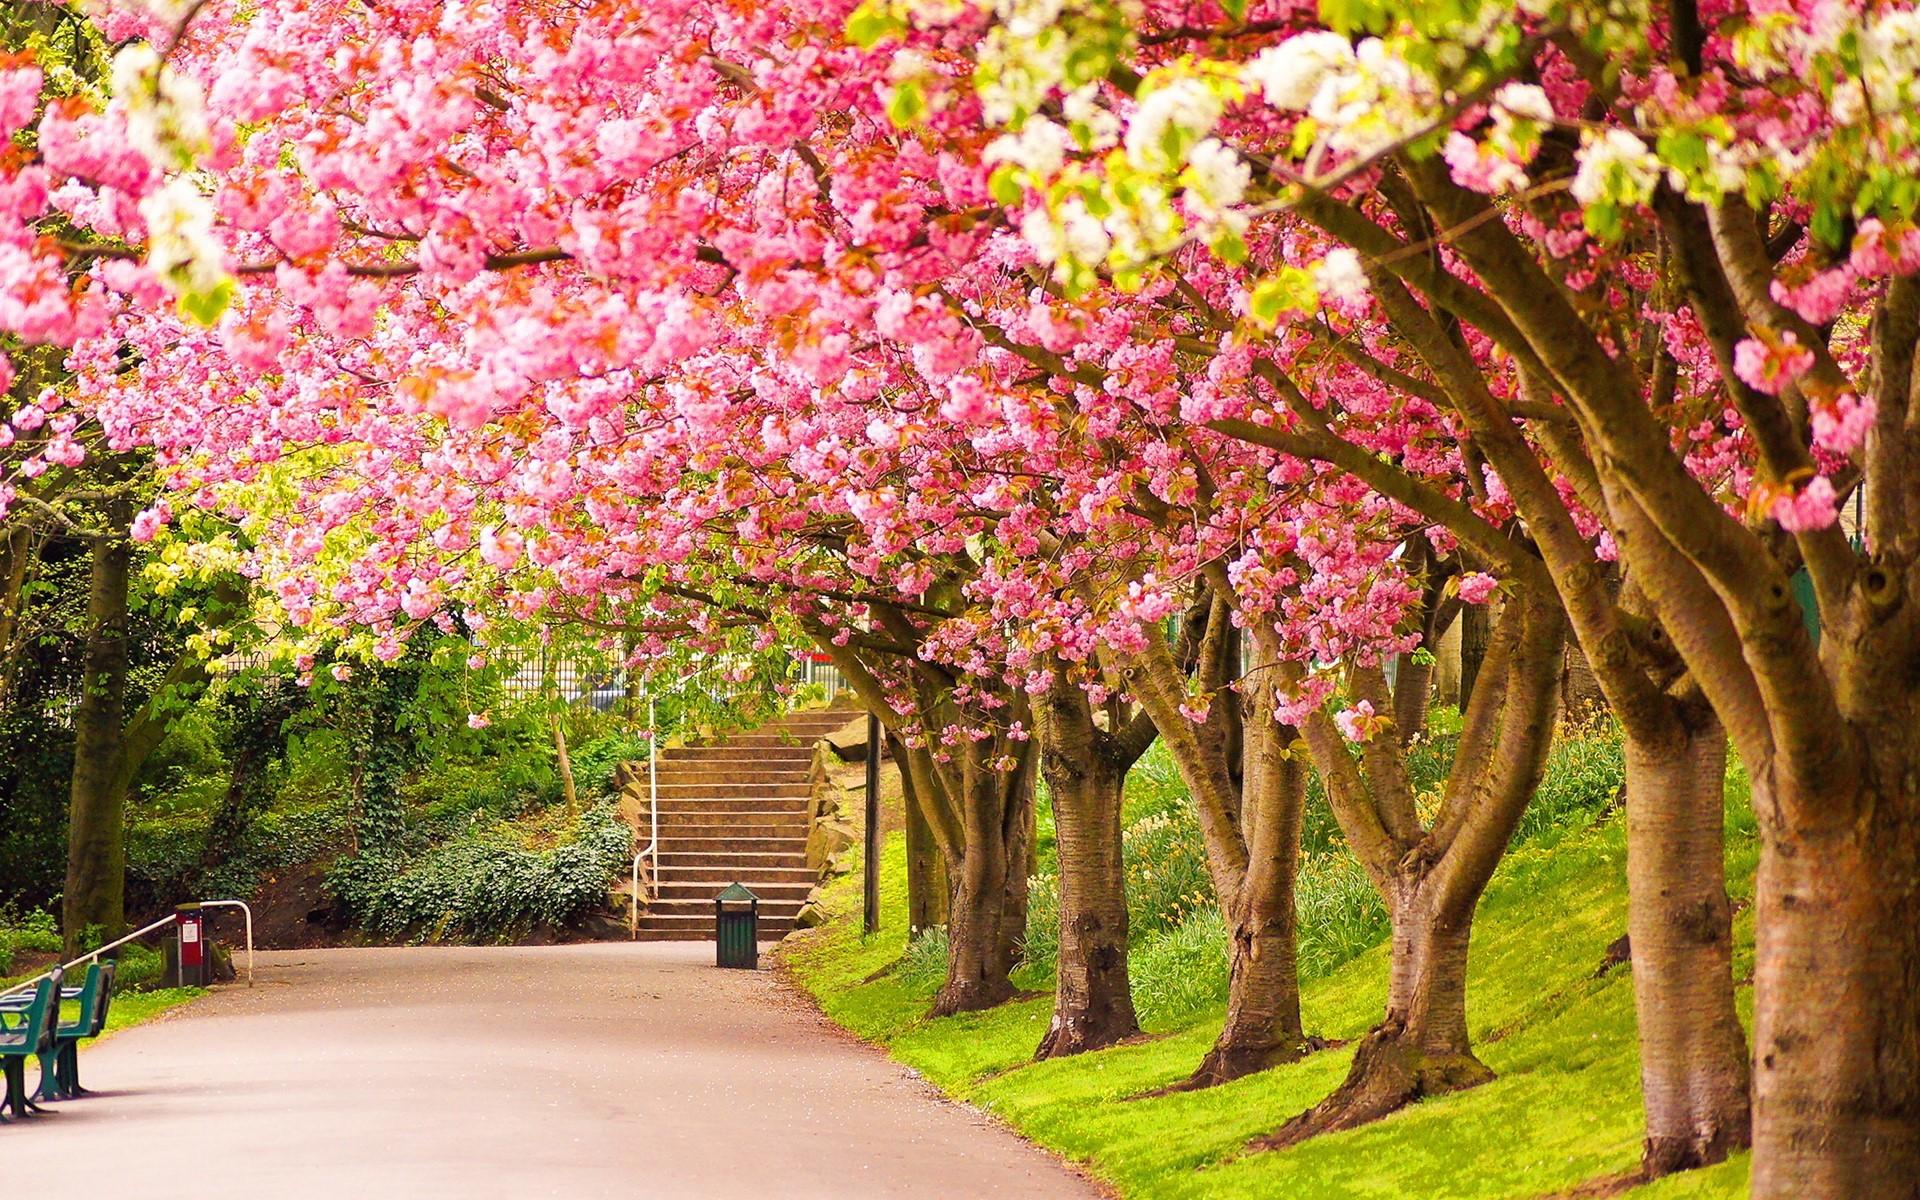 Spring nature desktop wallpaper.